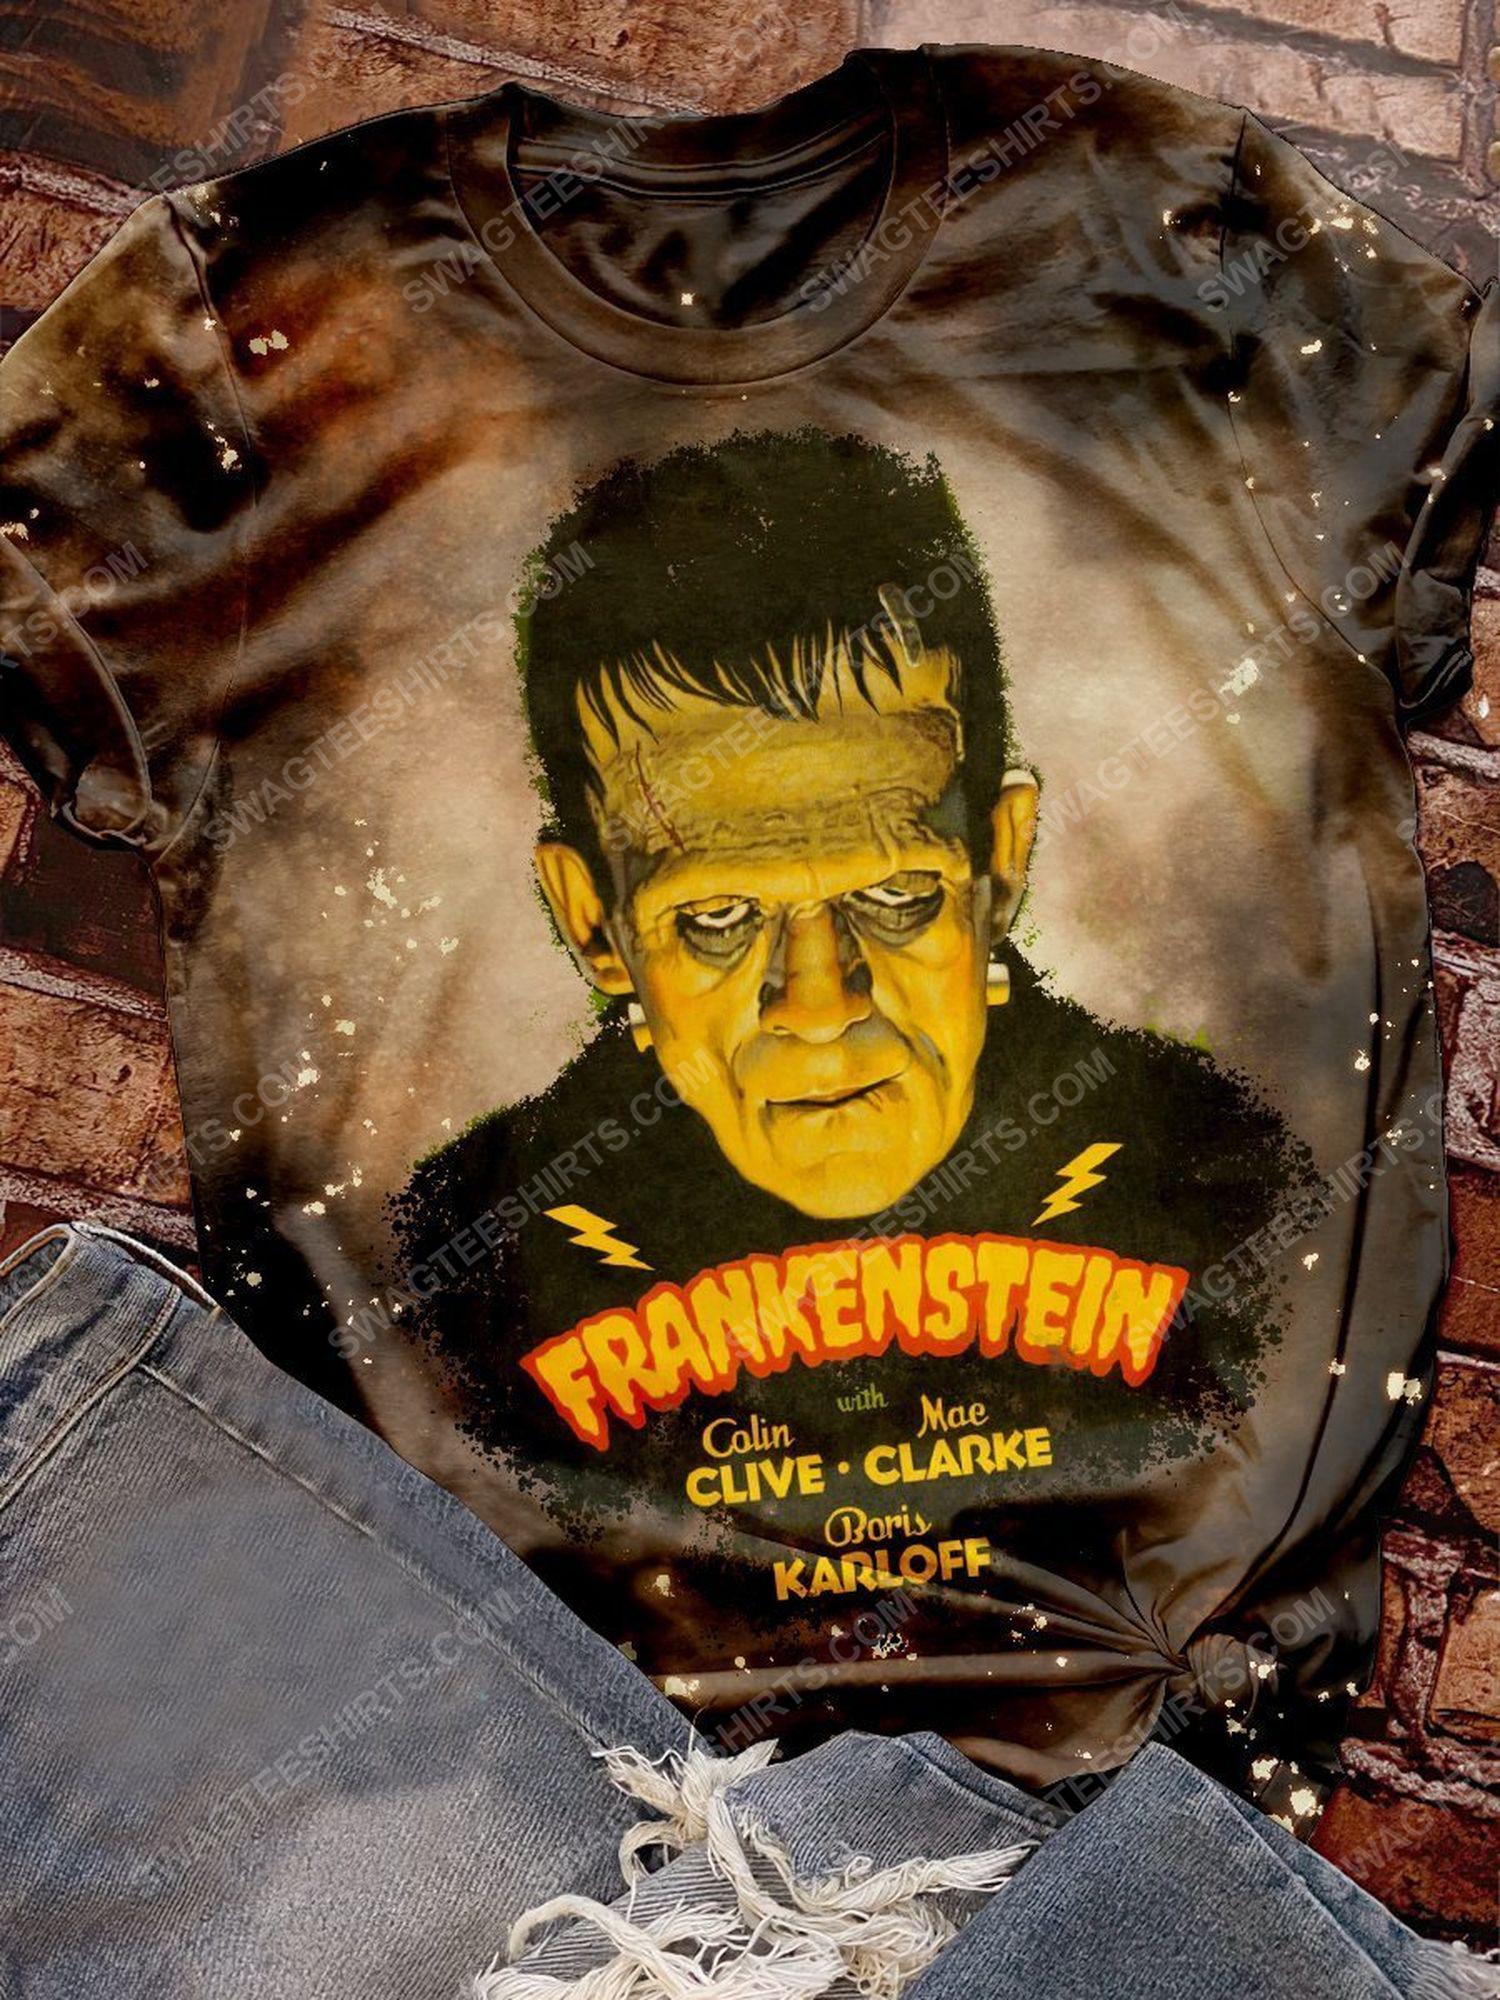 Halloween night and frankenstein movie bleached shirt 1 - Copy (3)